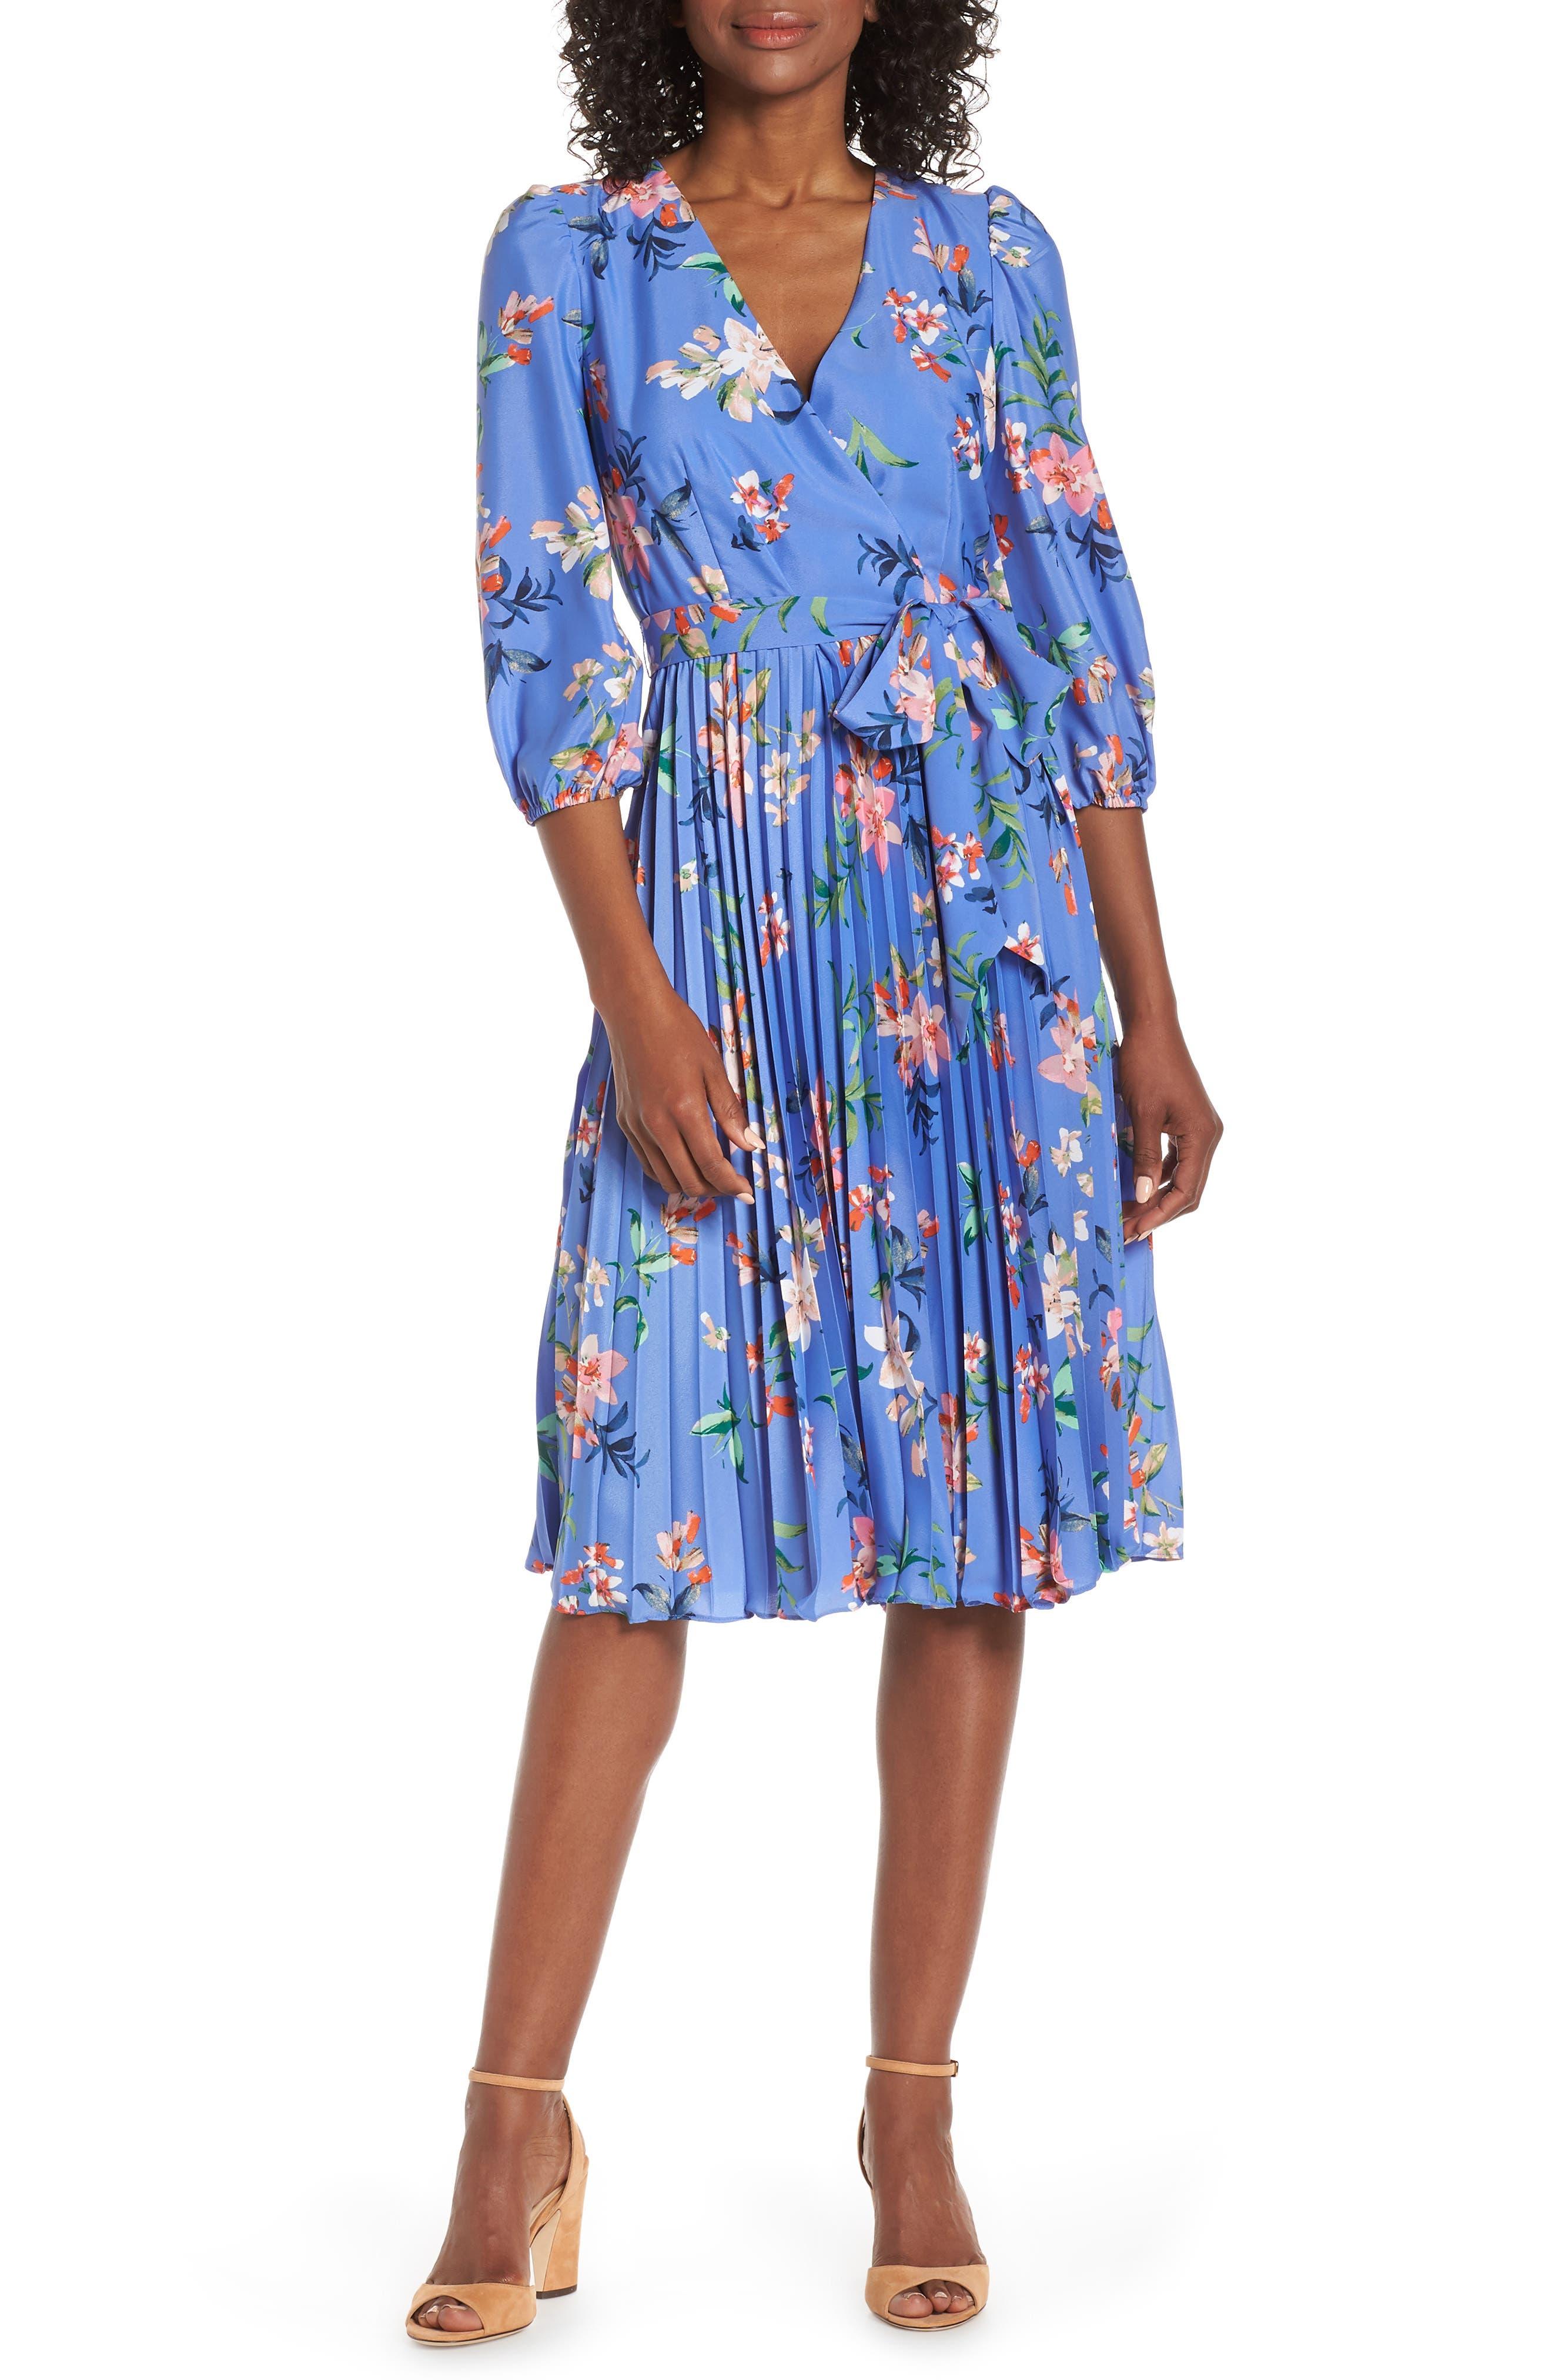 1930s Day Dresses, Afternoon Dresses History Womens Eliza J Pleated Faux Wrap Dress Size 8 - Blue $158.00 AT vintagedancer.com